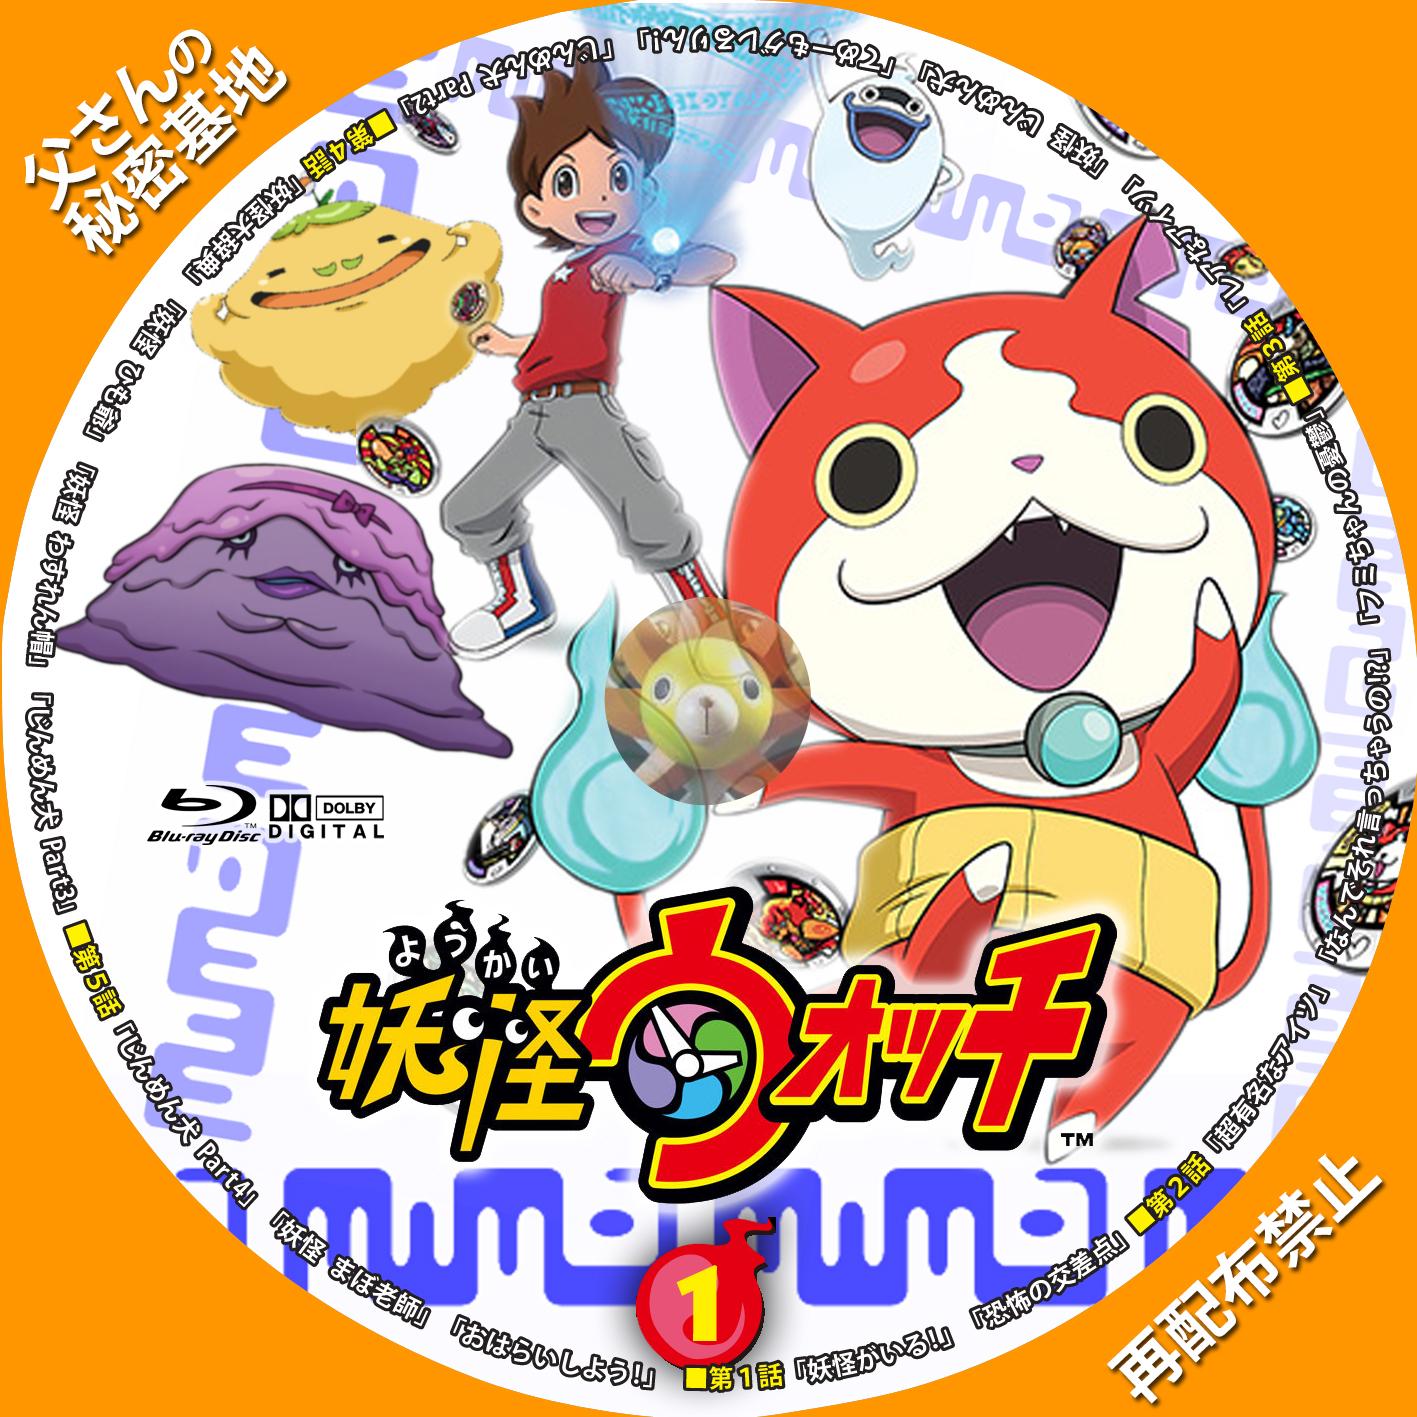 youkai-watchBD_01b.jpg